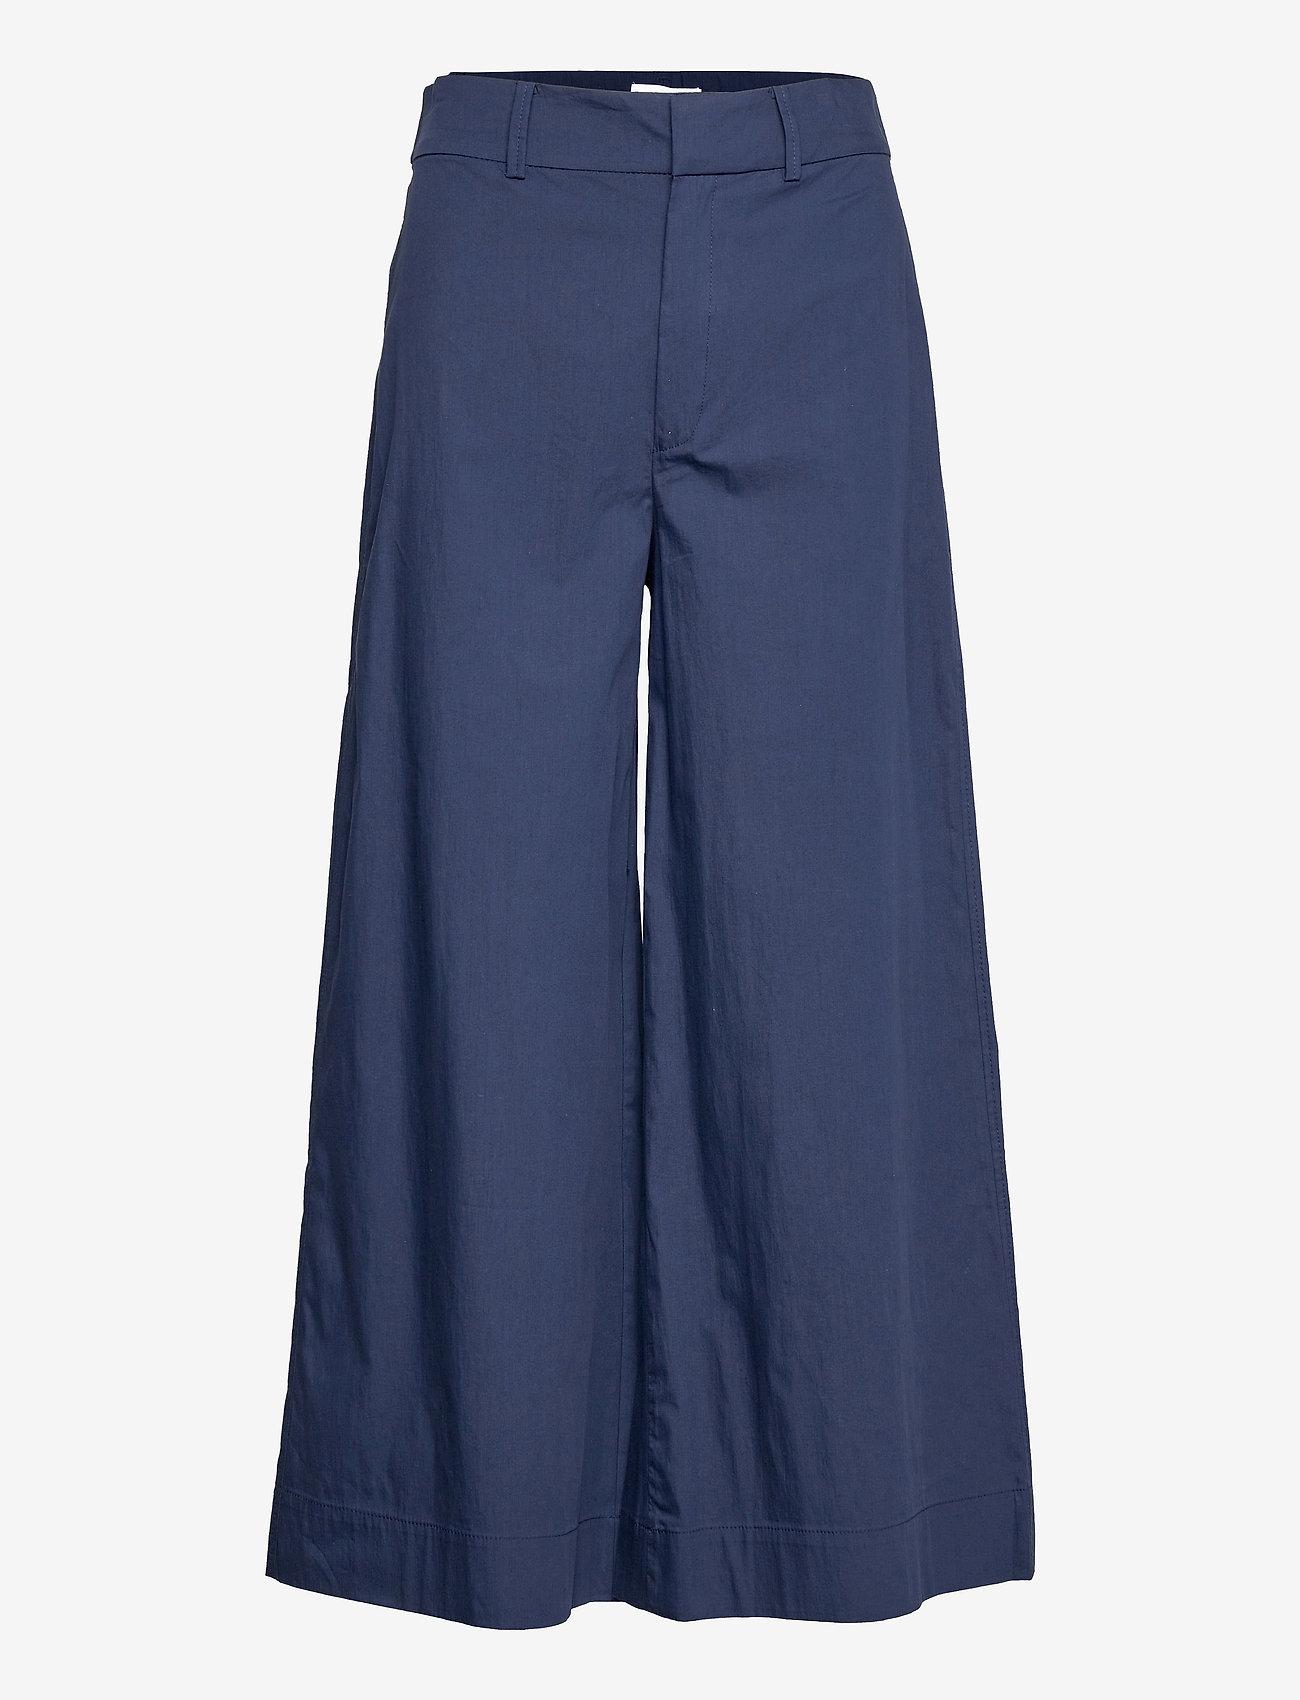 Mango - CIEL - bukser med brede ben - navy - 0